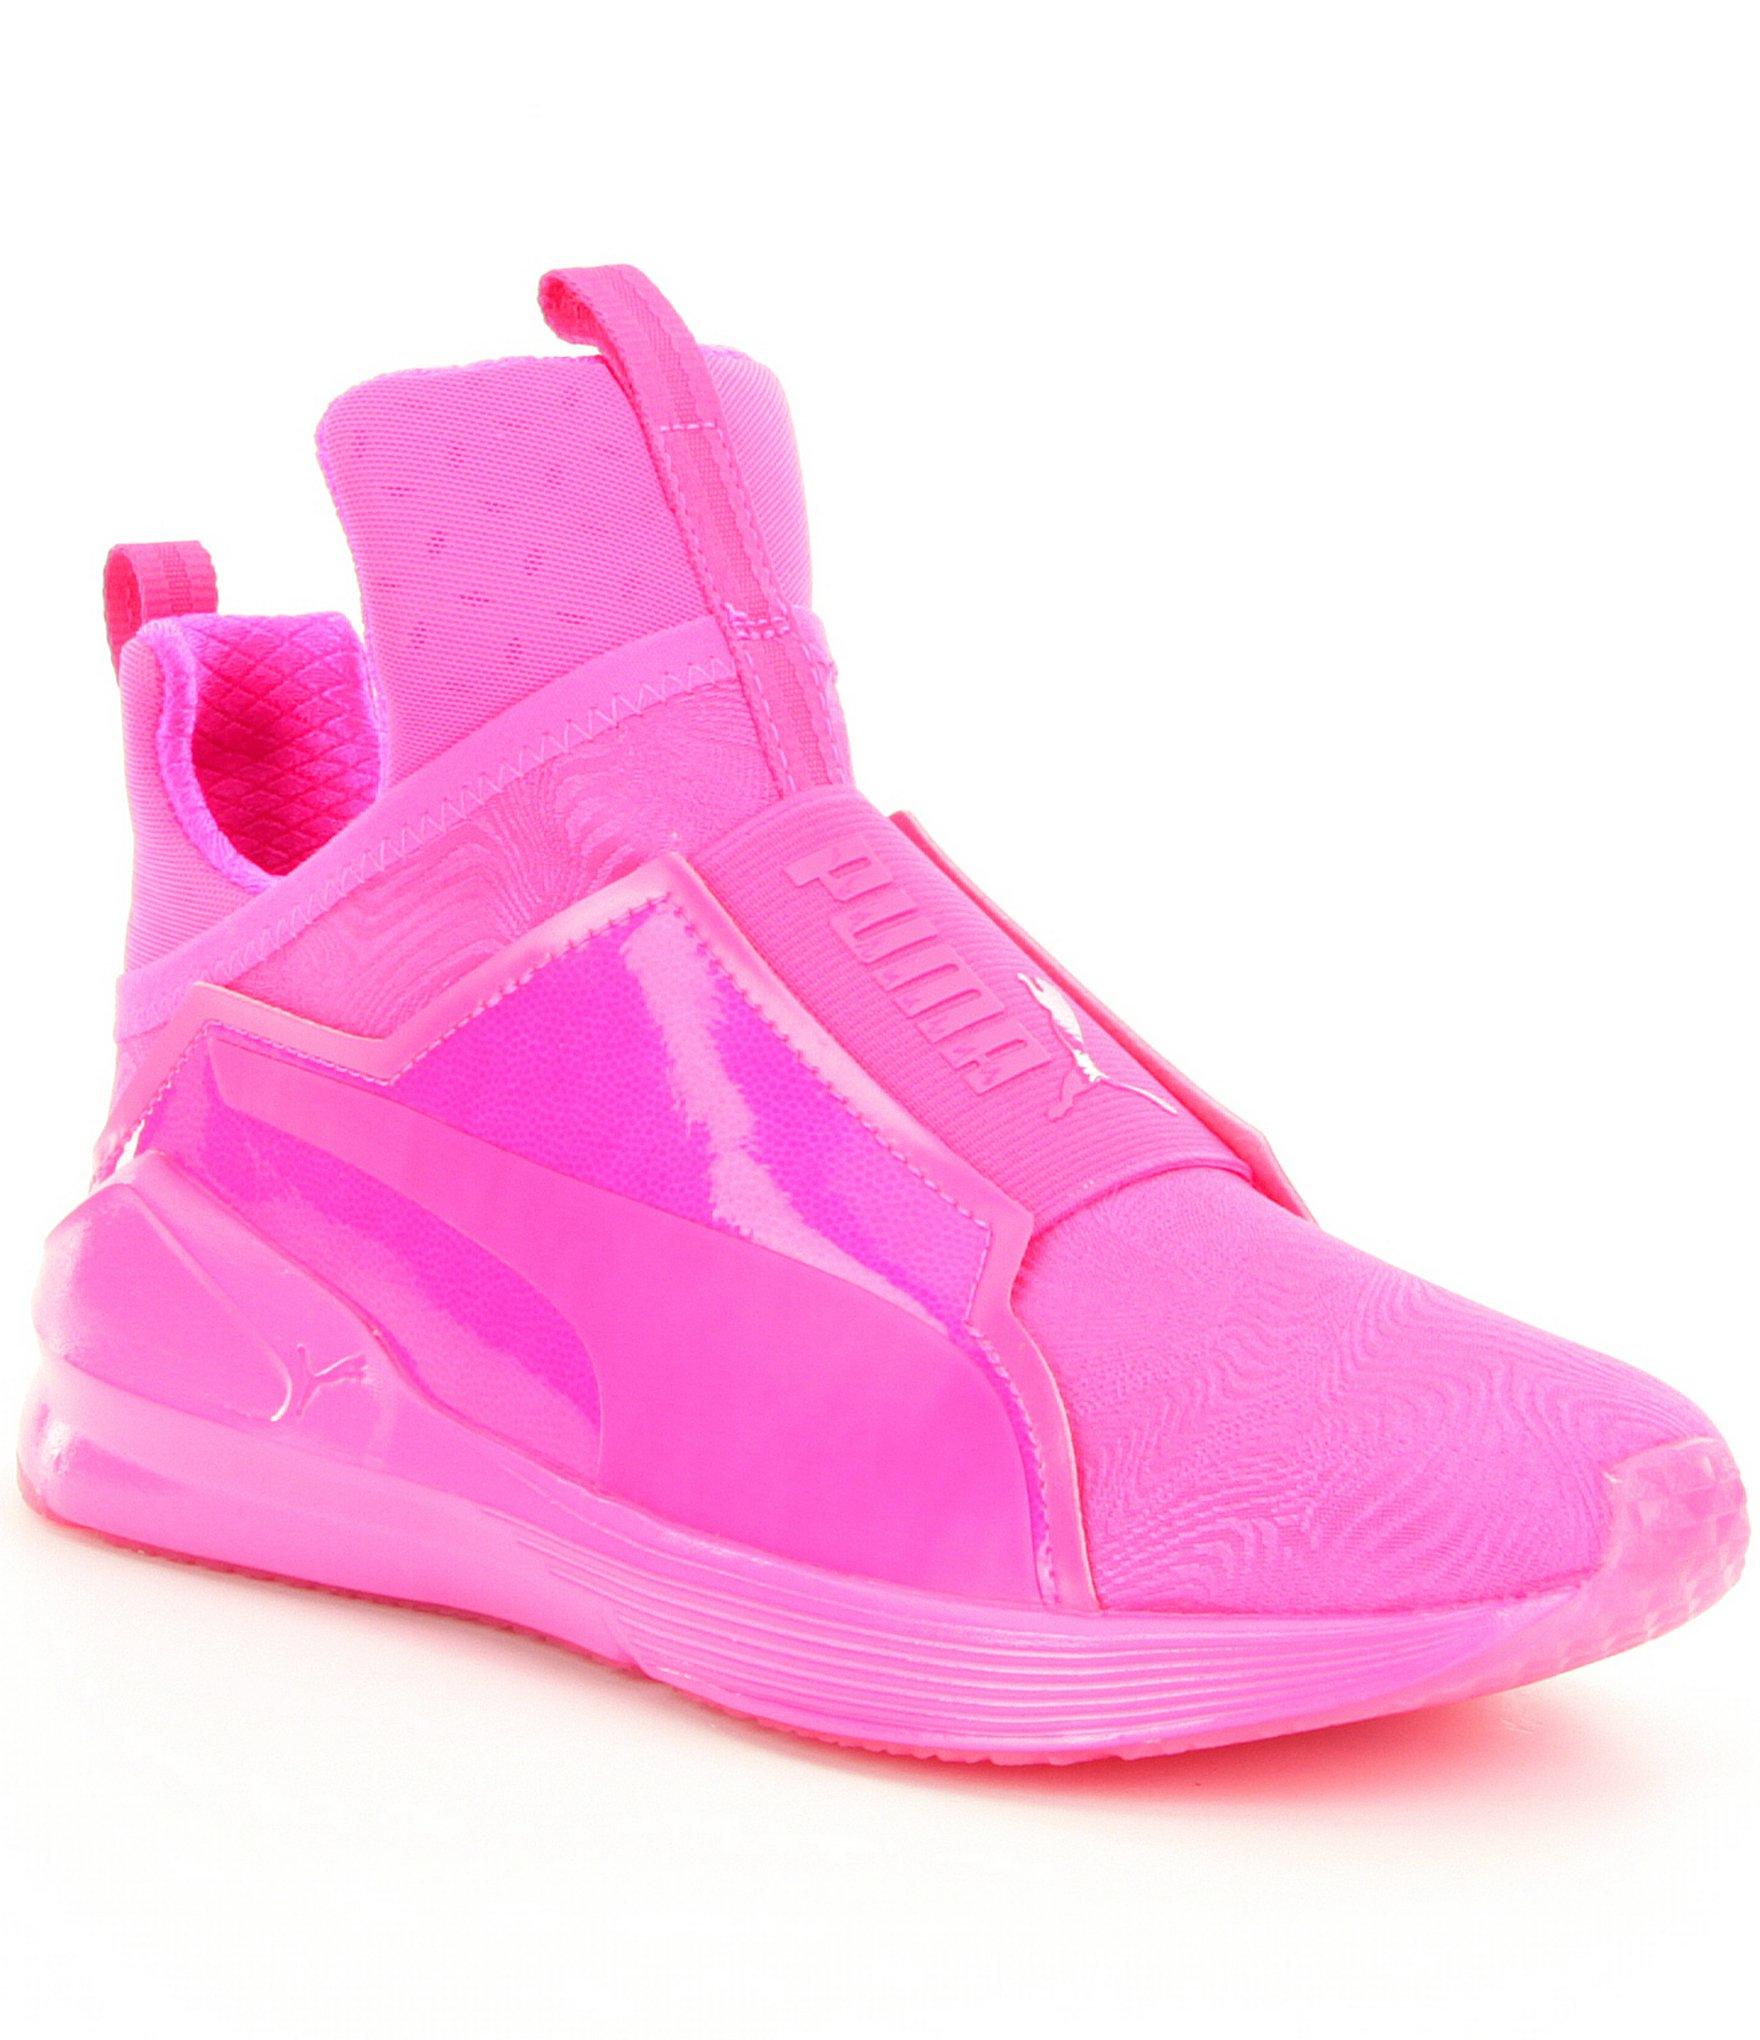 brand new d2775 14ef4 PUMA Fierce Bright Women s Training Shoes in Pink - Lyst